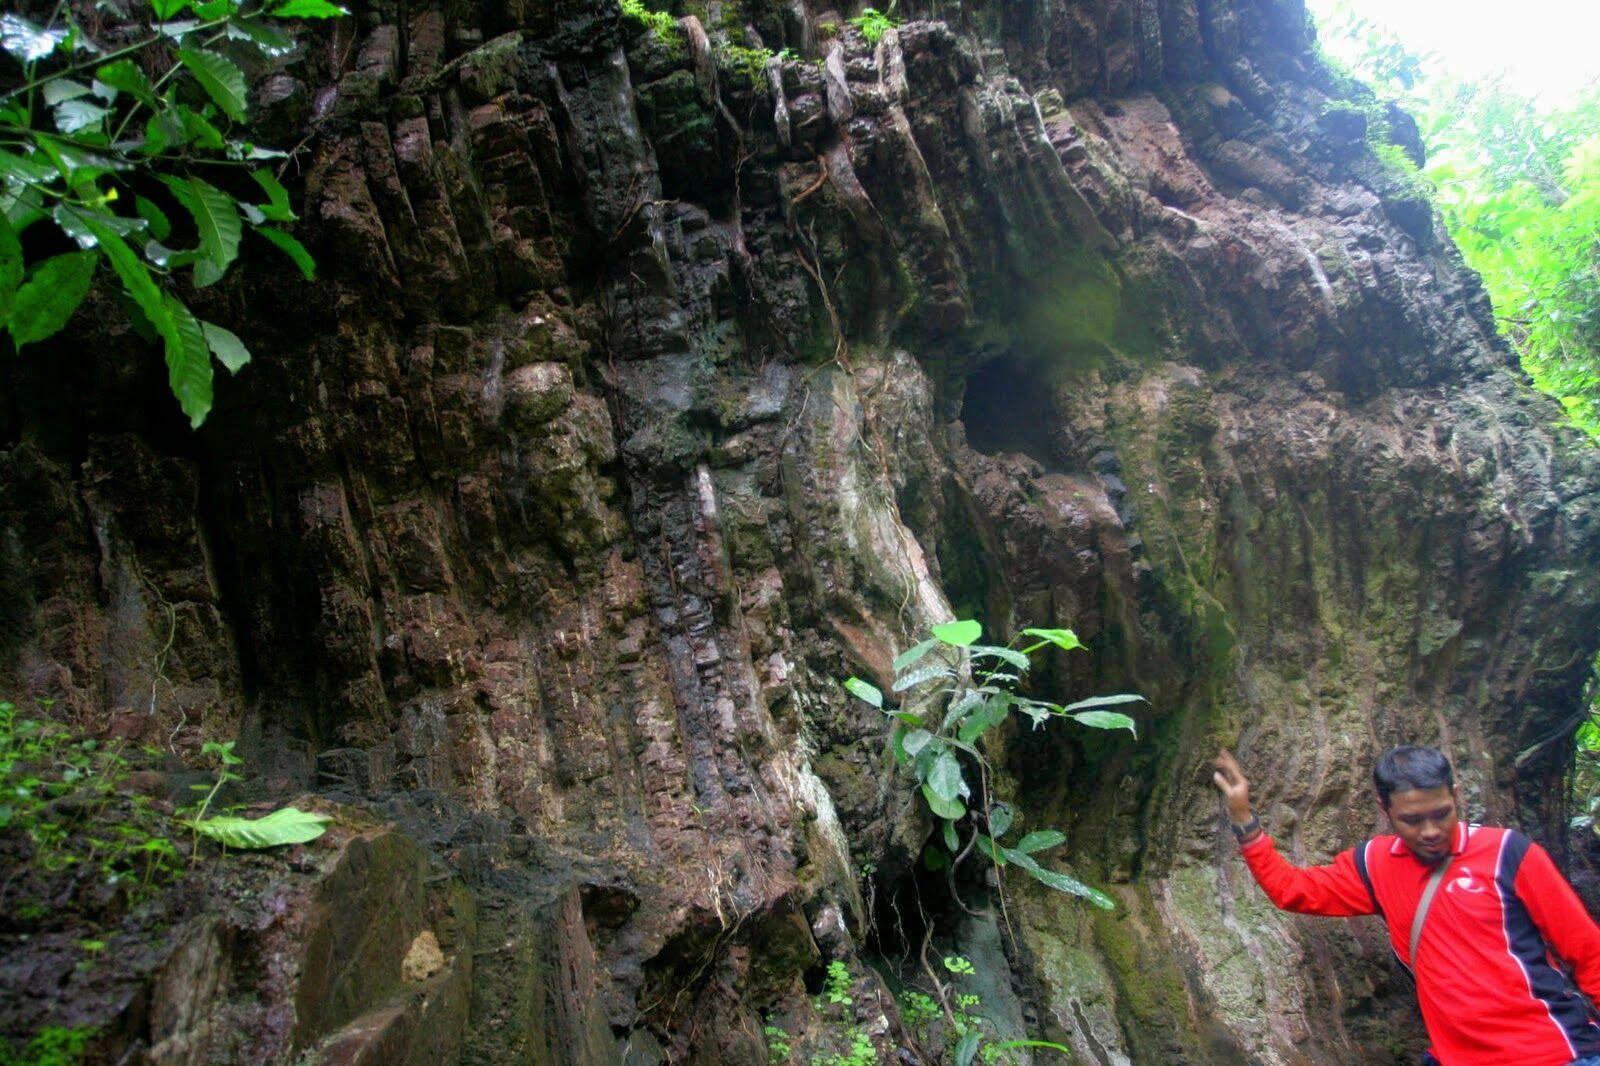 15 Kepingan Surga di Kebumen Ini Bikin Gak Sabar Pengin Liburan